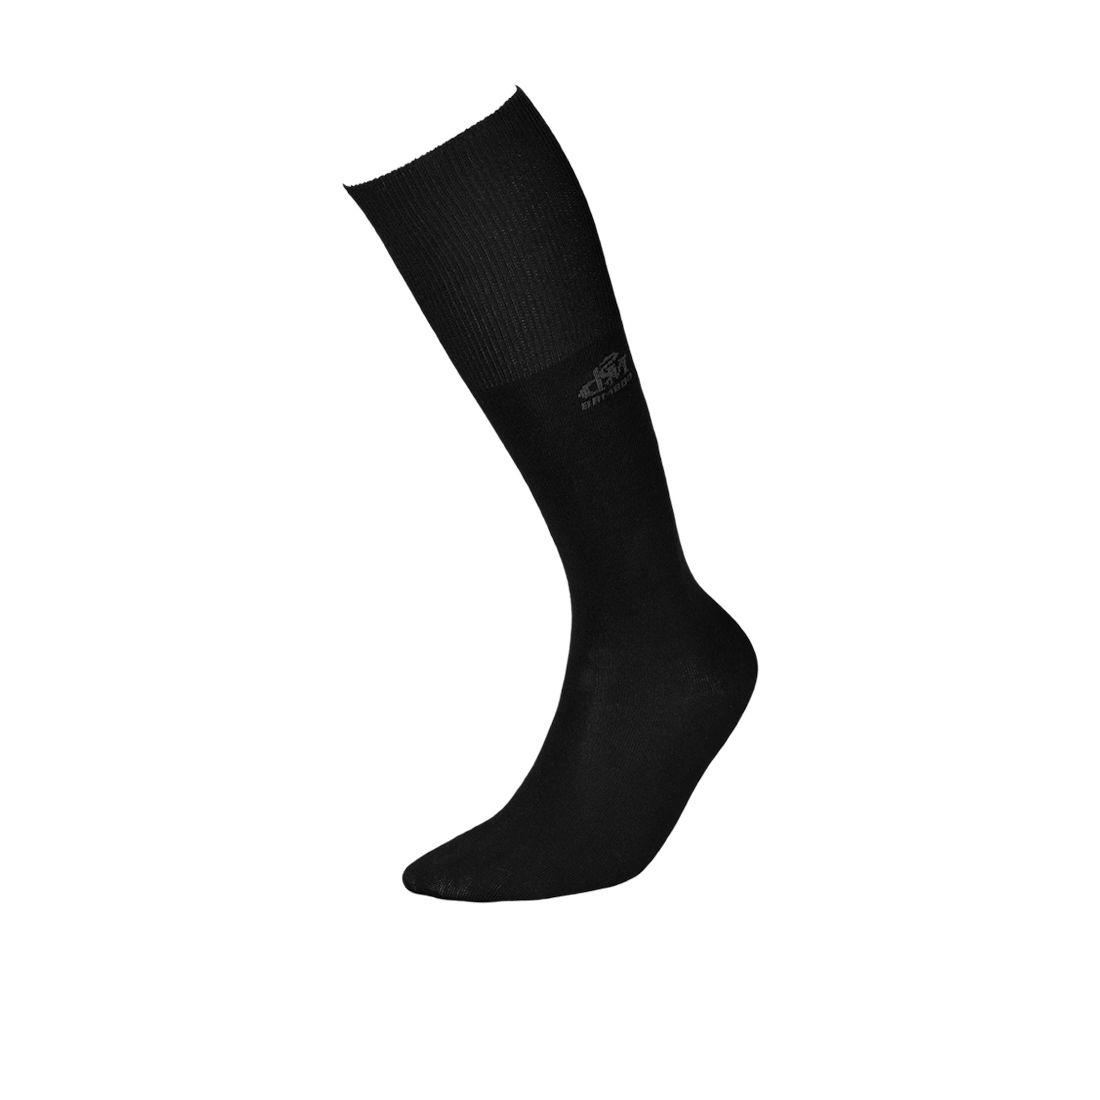 zdravotneponozky.sk - Zdravotné ponožky - Deomed bambo long ... 312948bc96